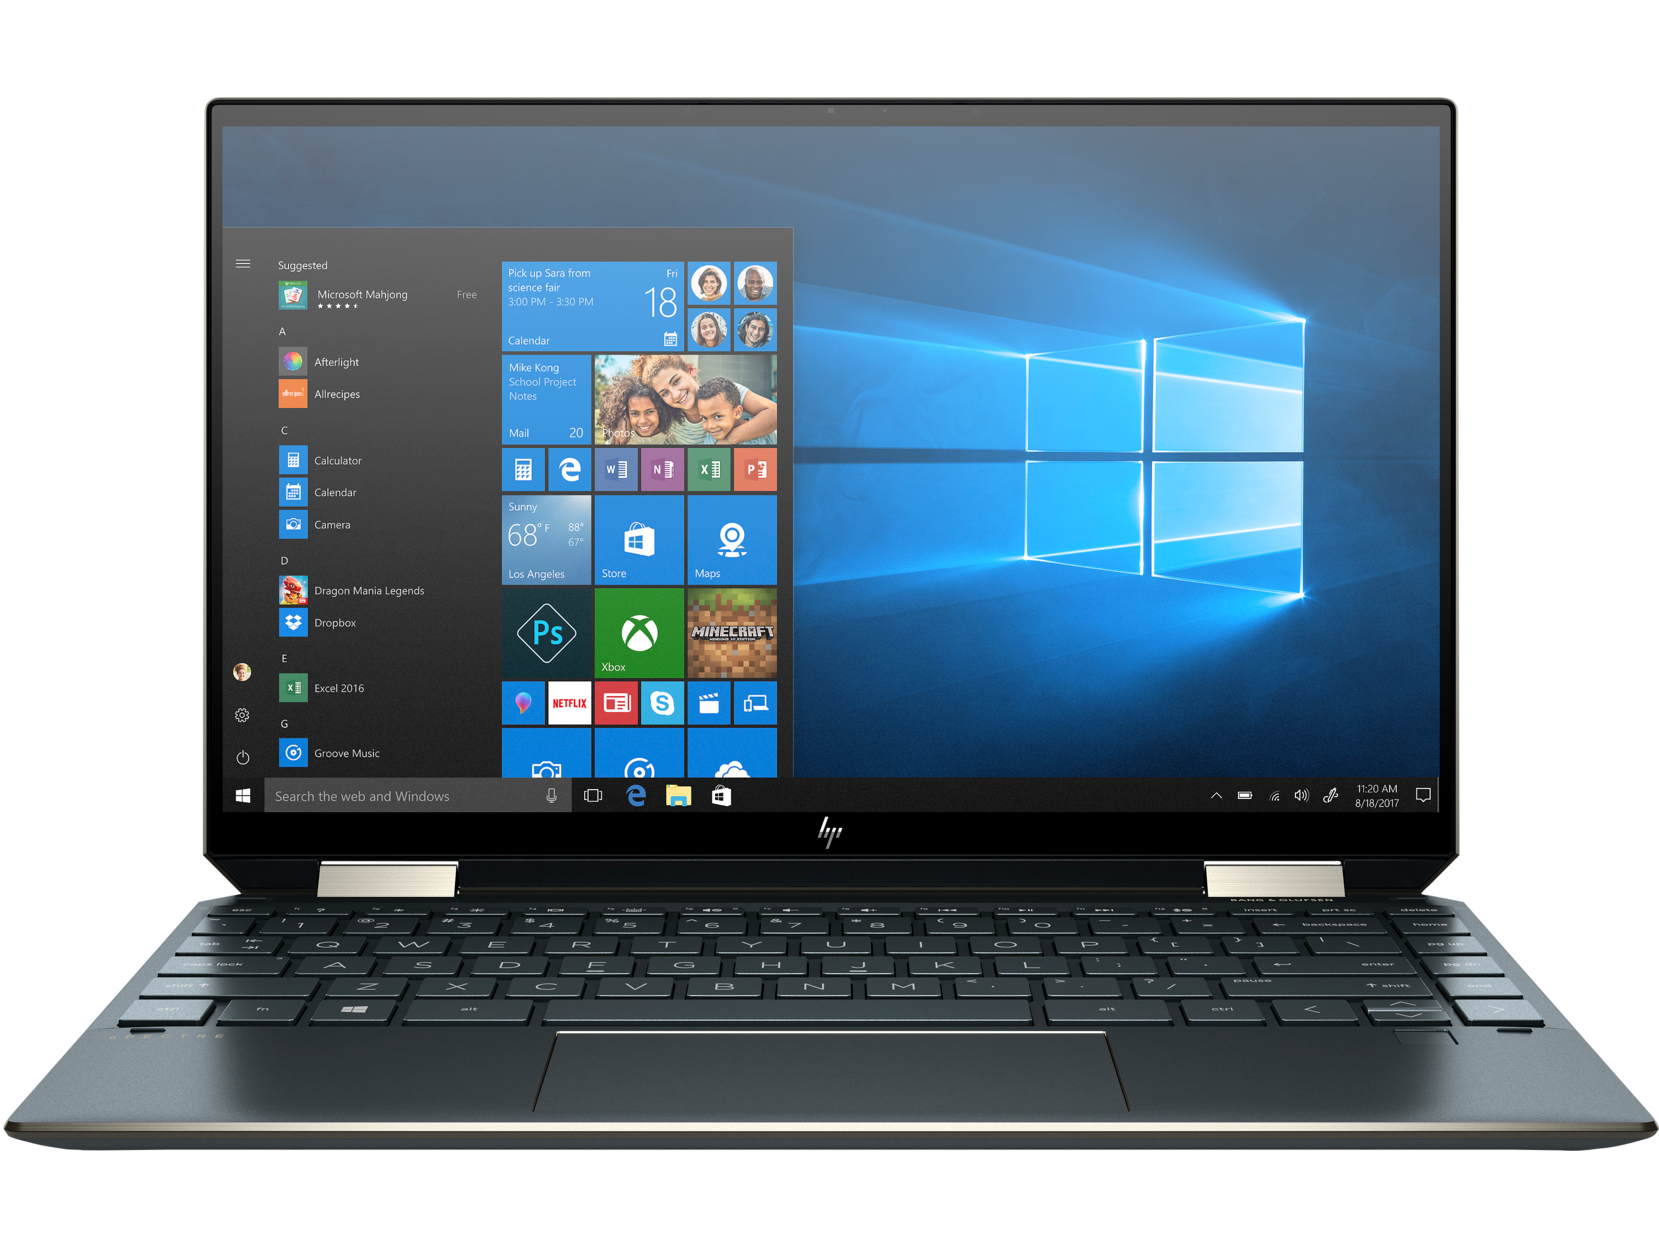 מחשב נייד HP Spectre x360 13-aw0004nj 3A689EA